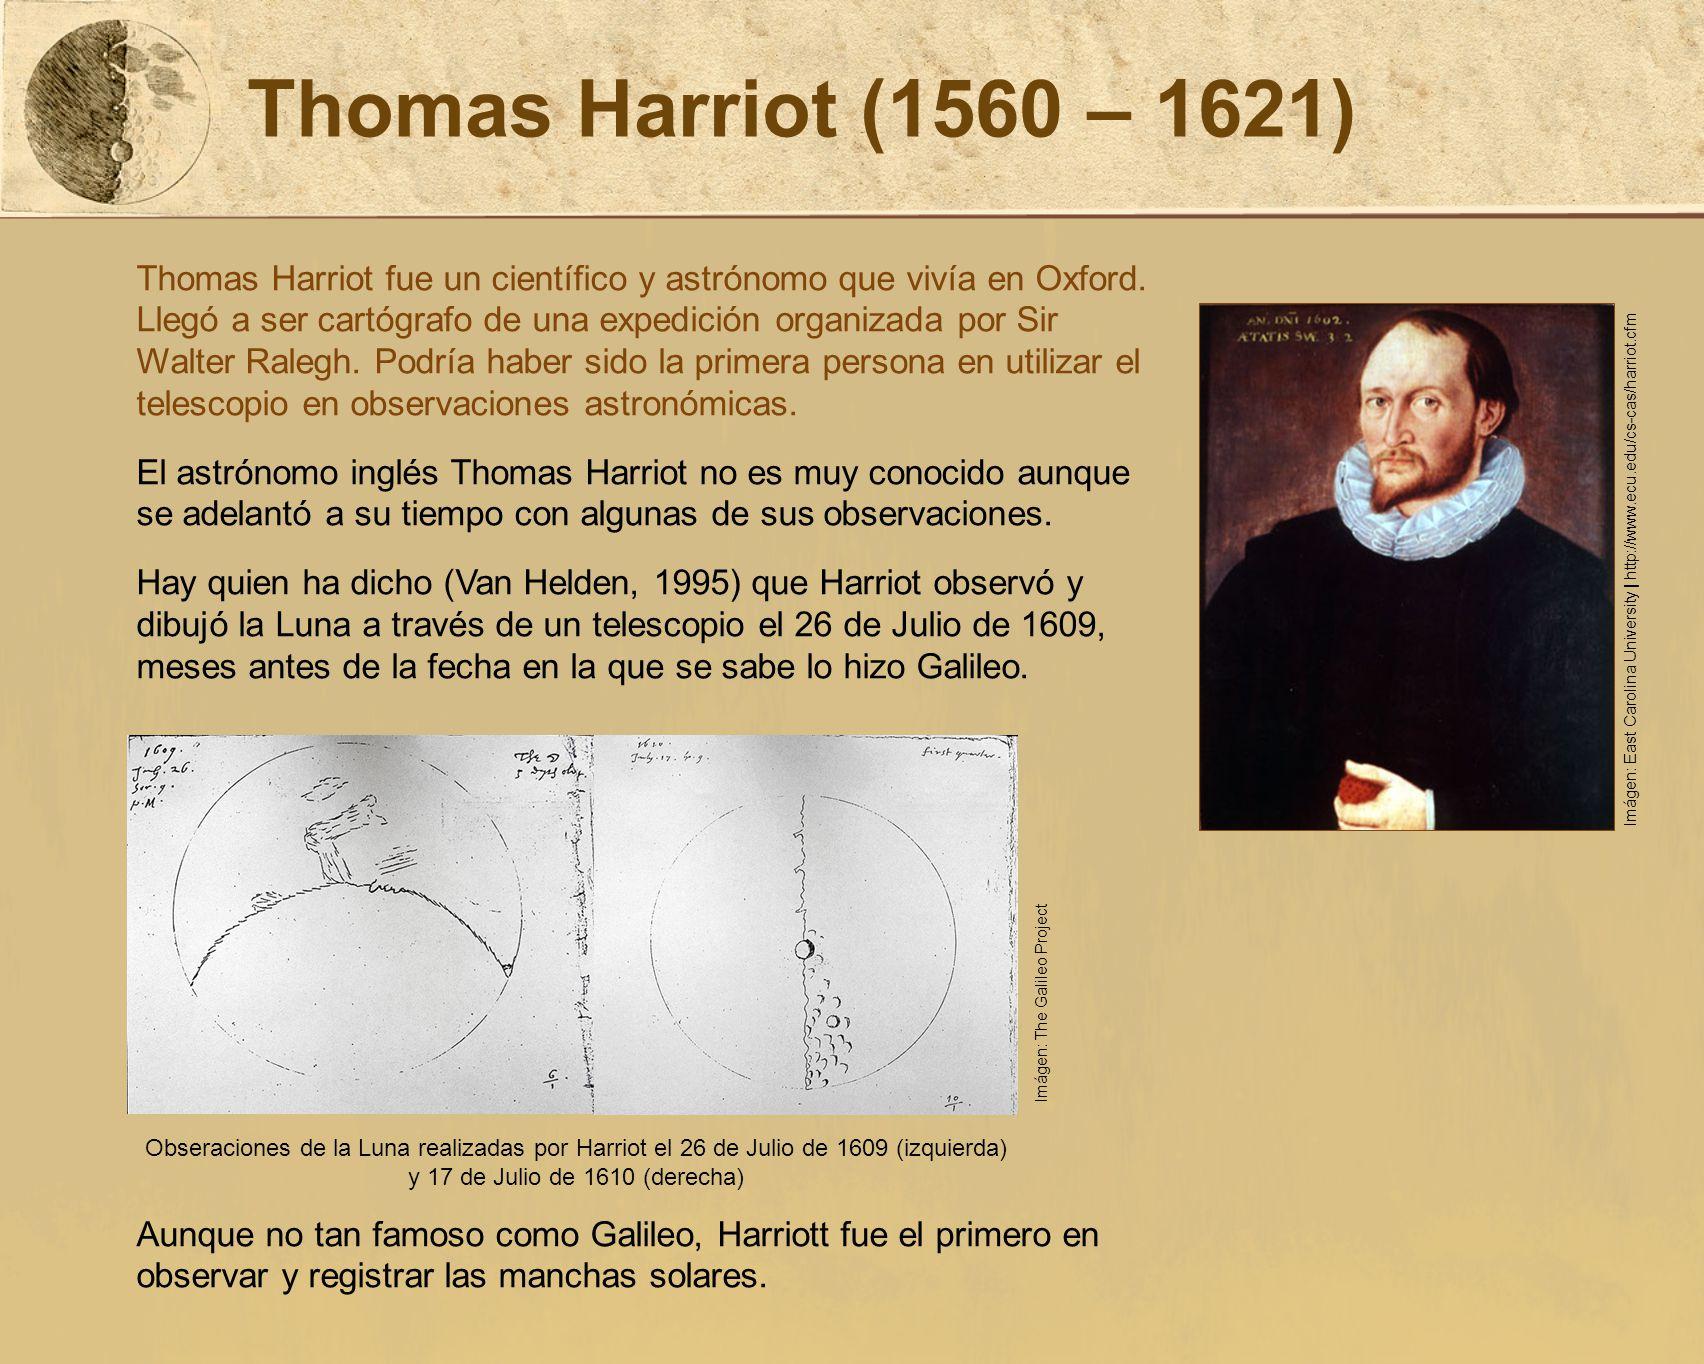 Thomas Harriot (1560 – 1621)